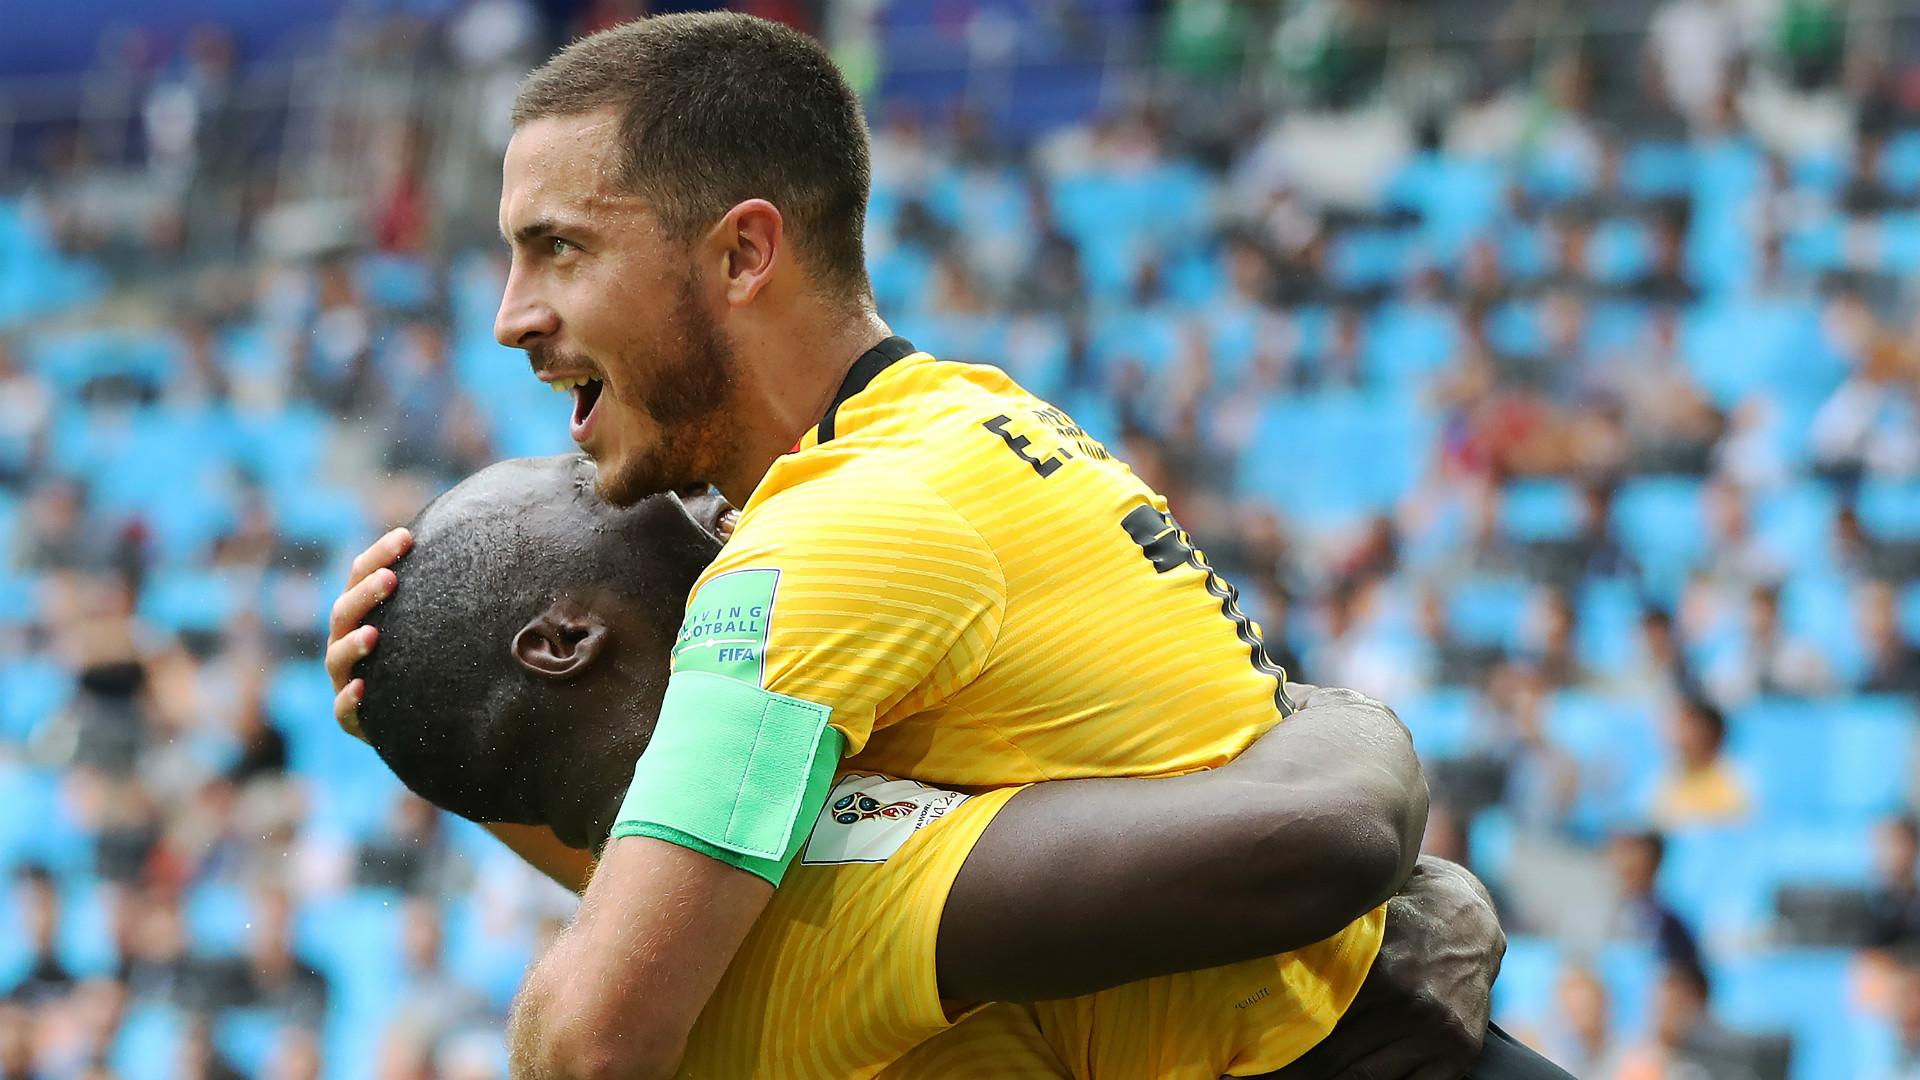 Lukaku Equals Ronaldo's Goal Tally as Belgium Take Control Against Tunisia